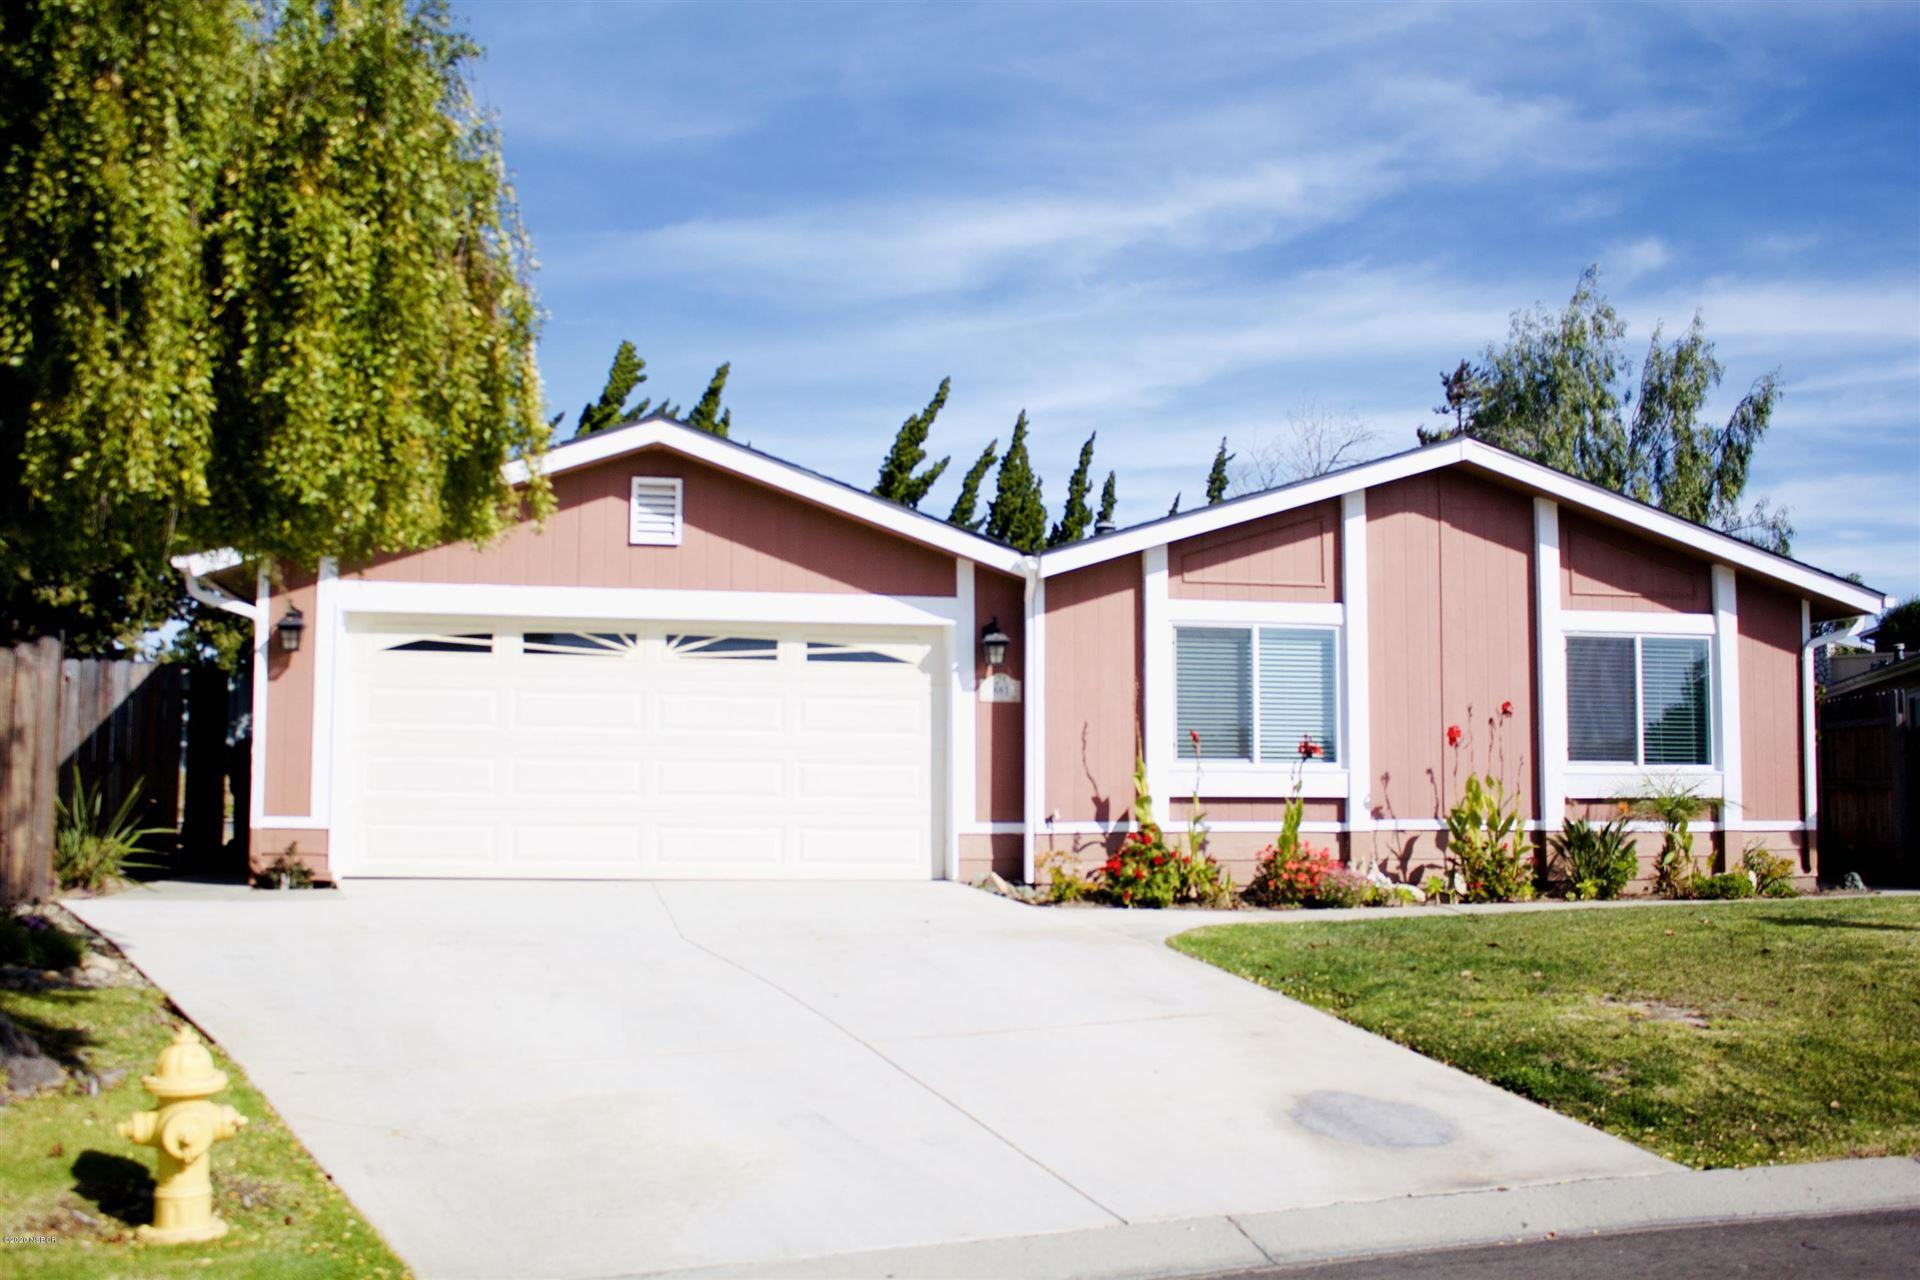 881 greenacre Drive, Santa Maria, CA 93455 - #: 20000327